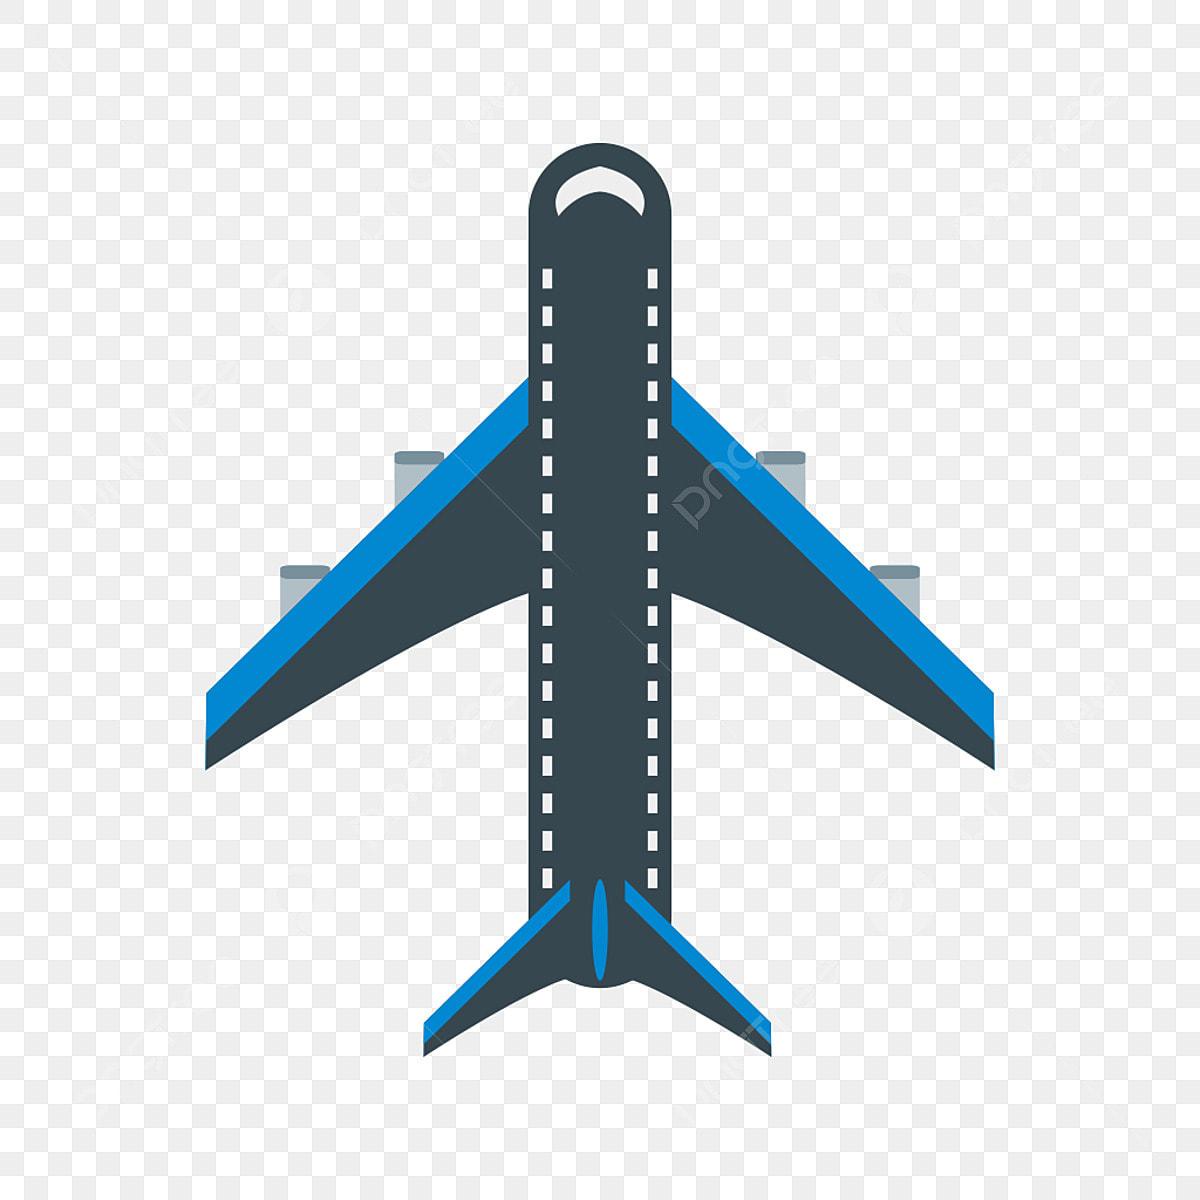 Airplane Vector Icon Airplane Icons Airplane Icon Plane Icon